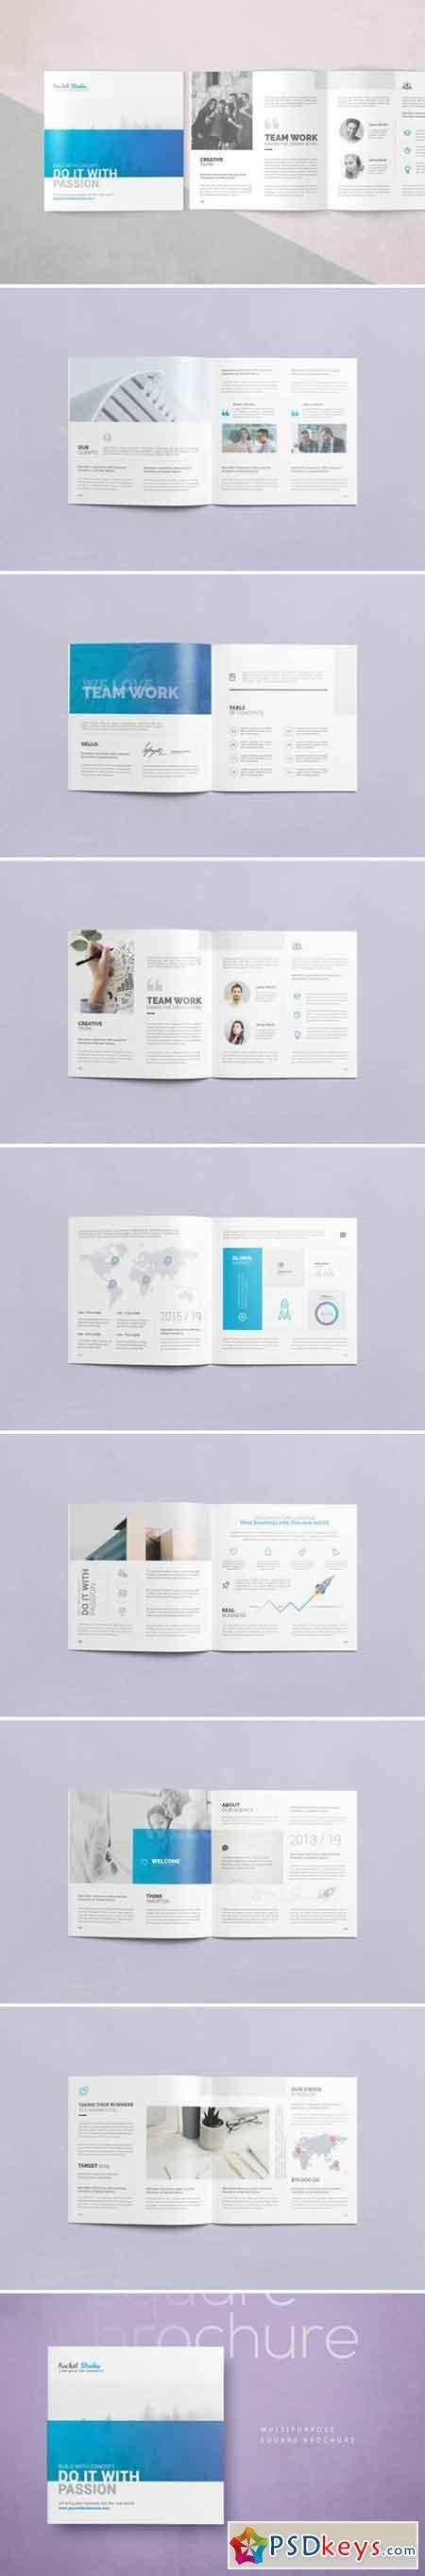 Multipurpose Square Brochure 2379768